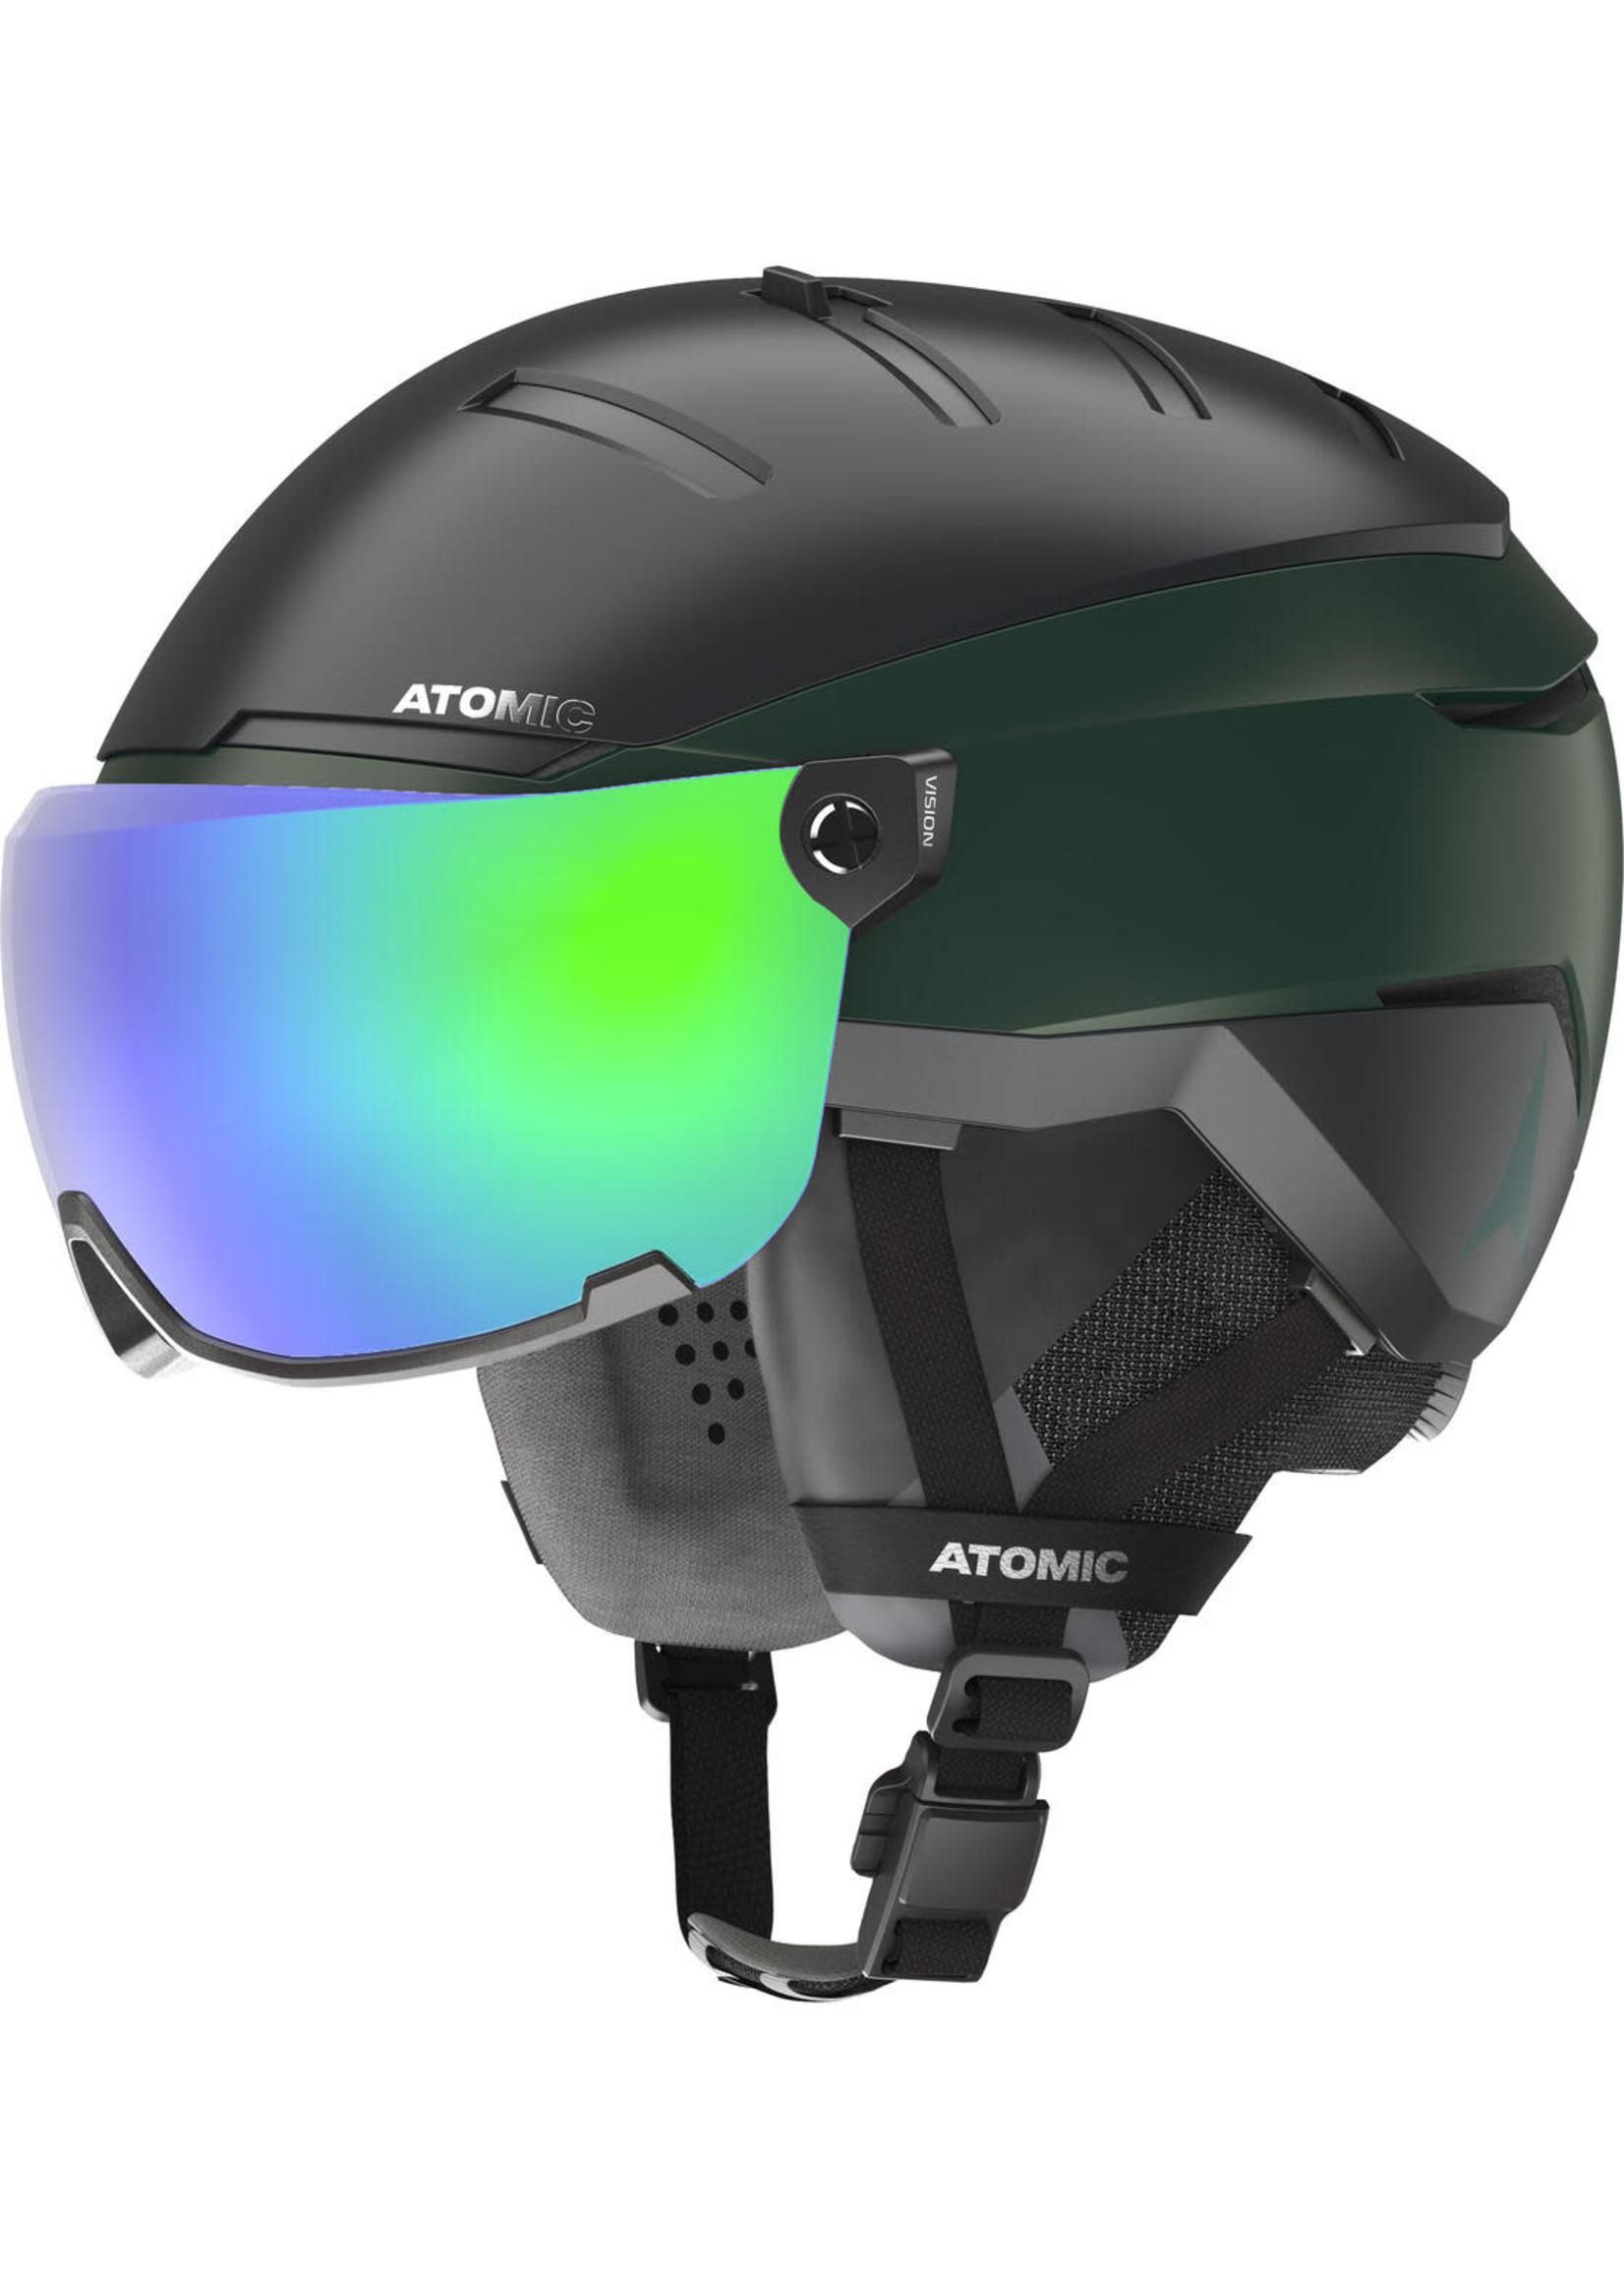 Atomic ATOMIC- Savor GT AMID Visor HD